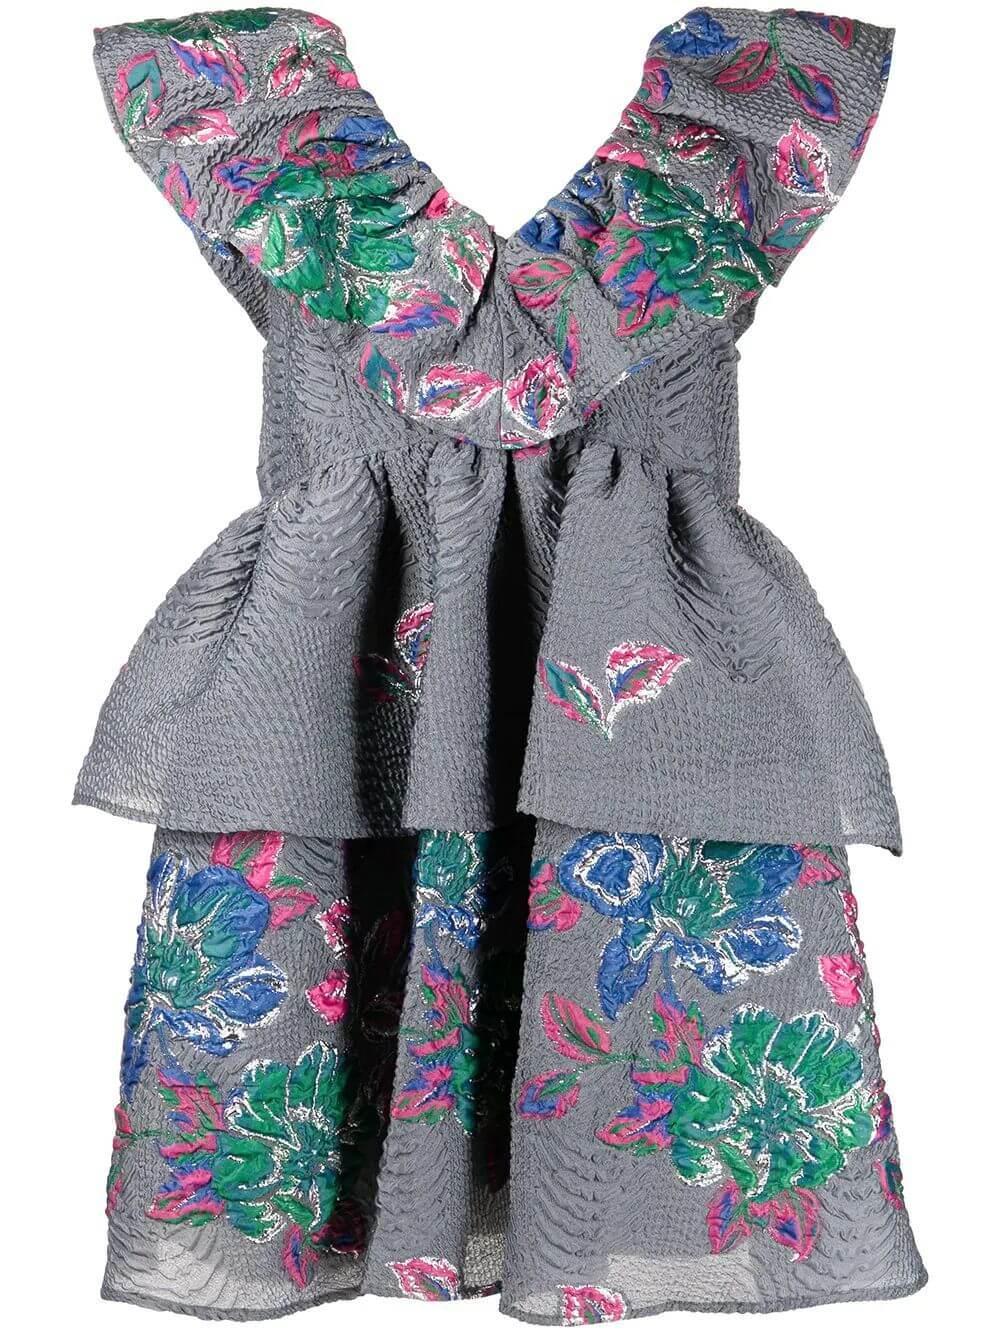 Crinkled Jacquard Dress Item # F6080